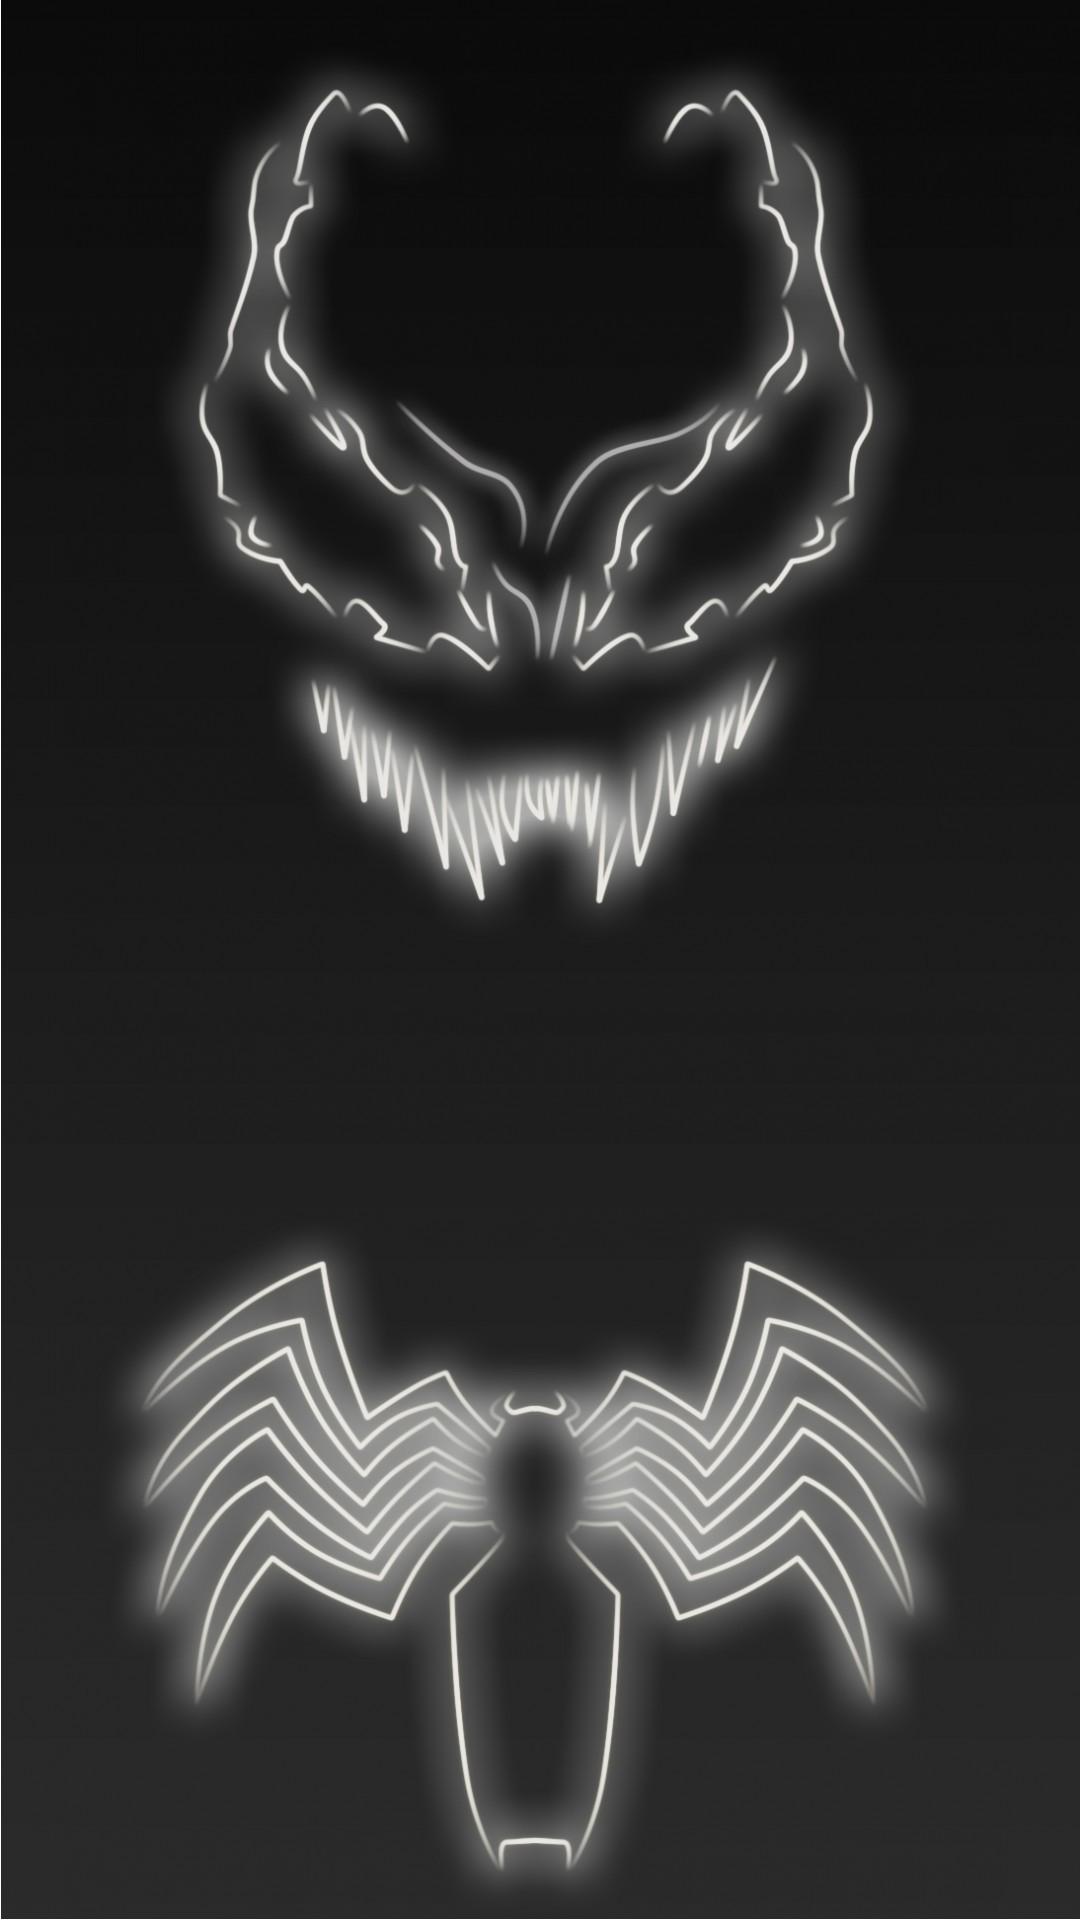 Live Photo Video Iphone X Wallpaper Venom Wallpaper Hd 64 Images